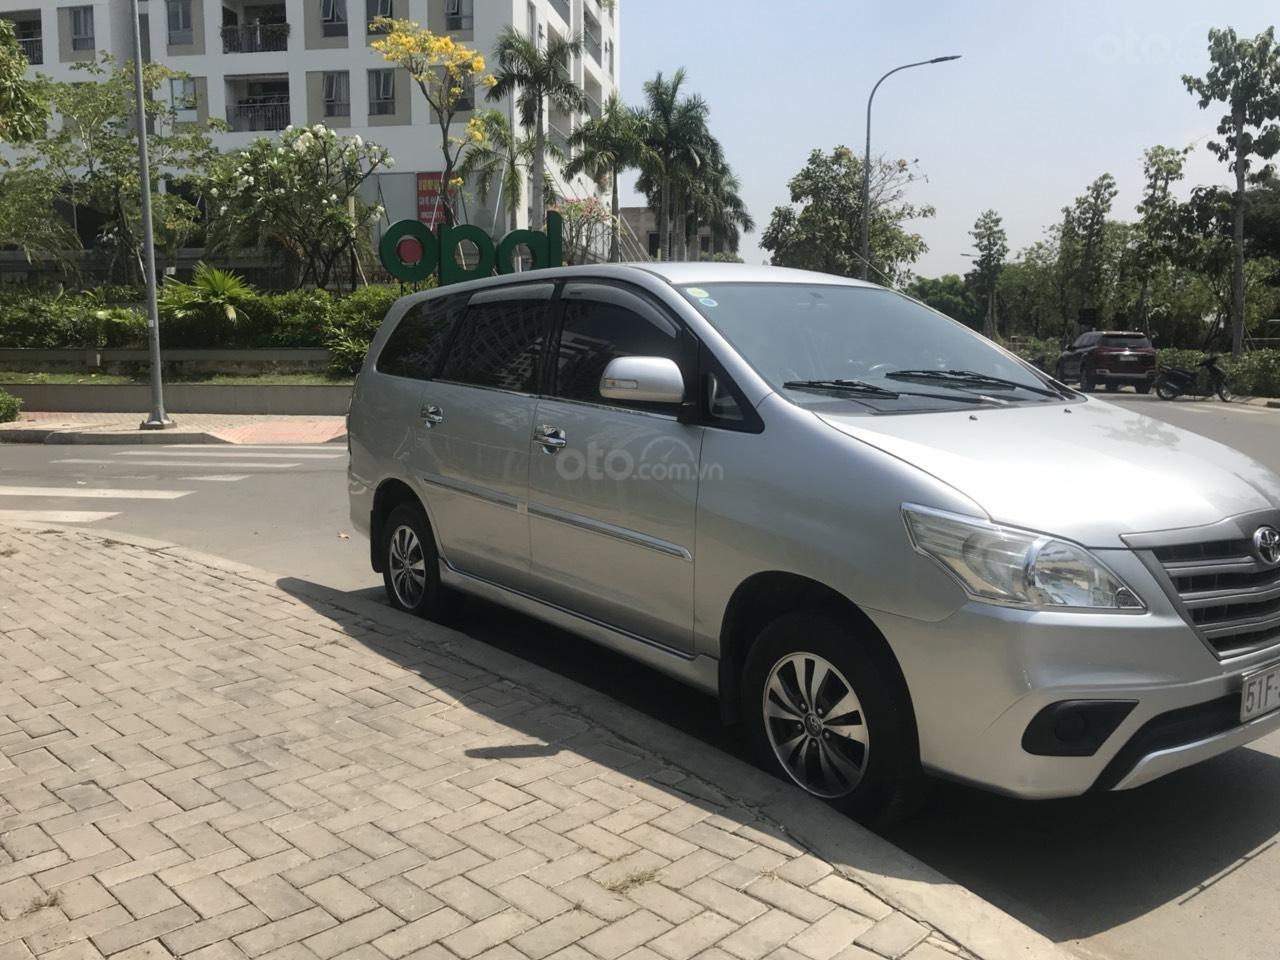 Chính chủ cần bán Toyota Innova đời 2015 (3)